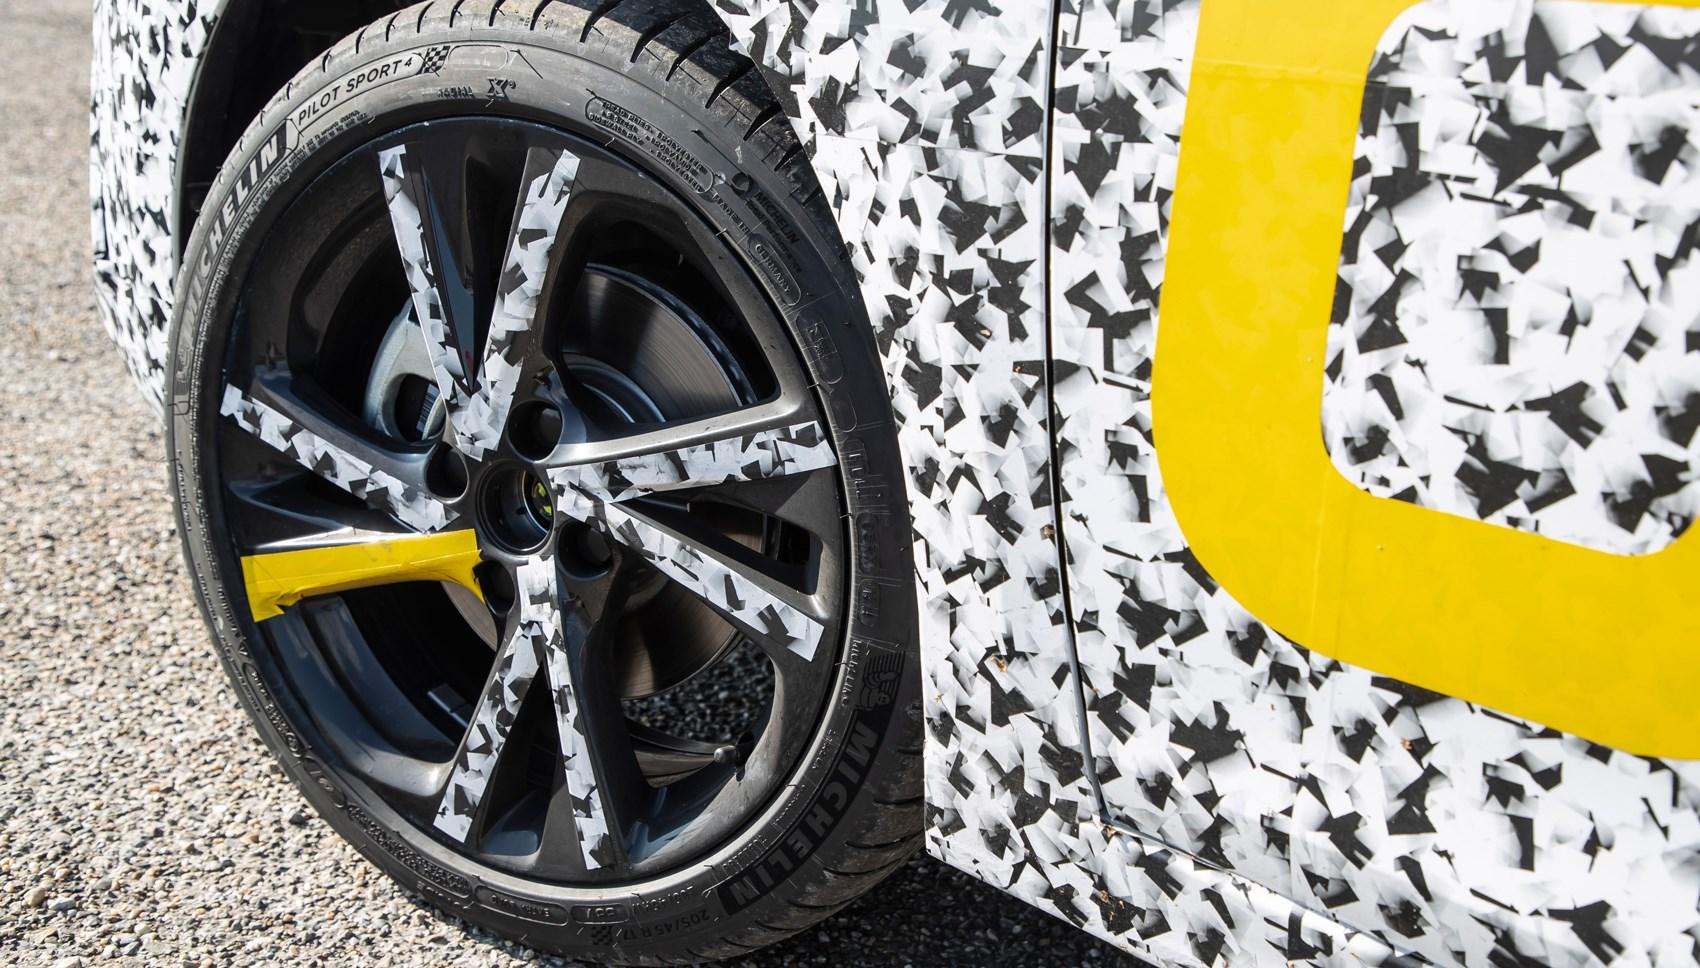 Vauxhall Corsa pre-production wheel